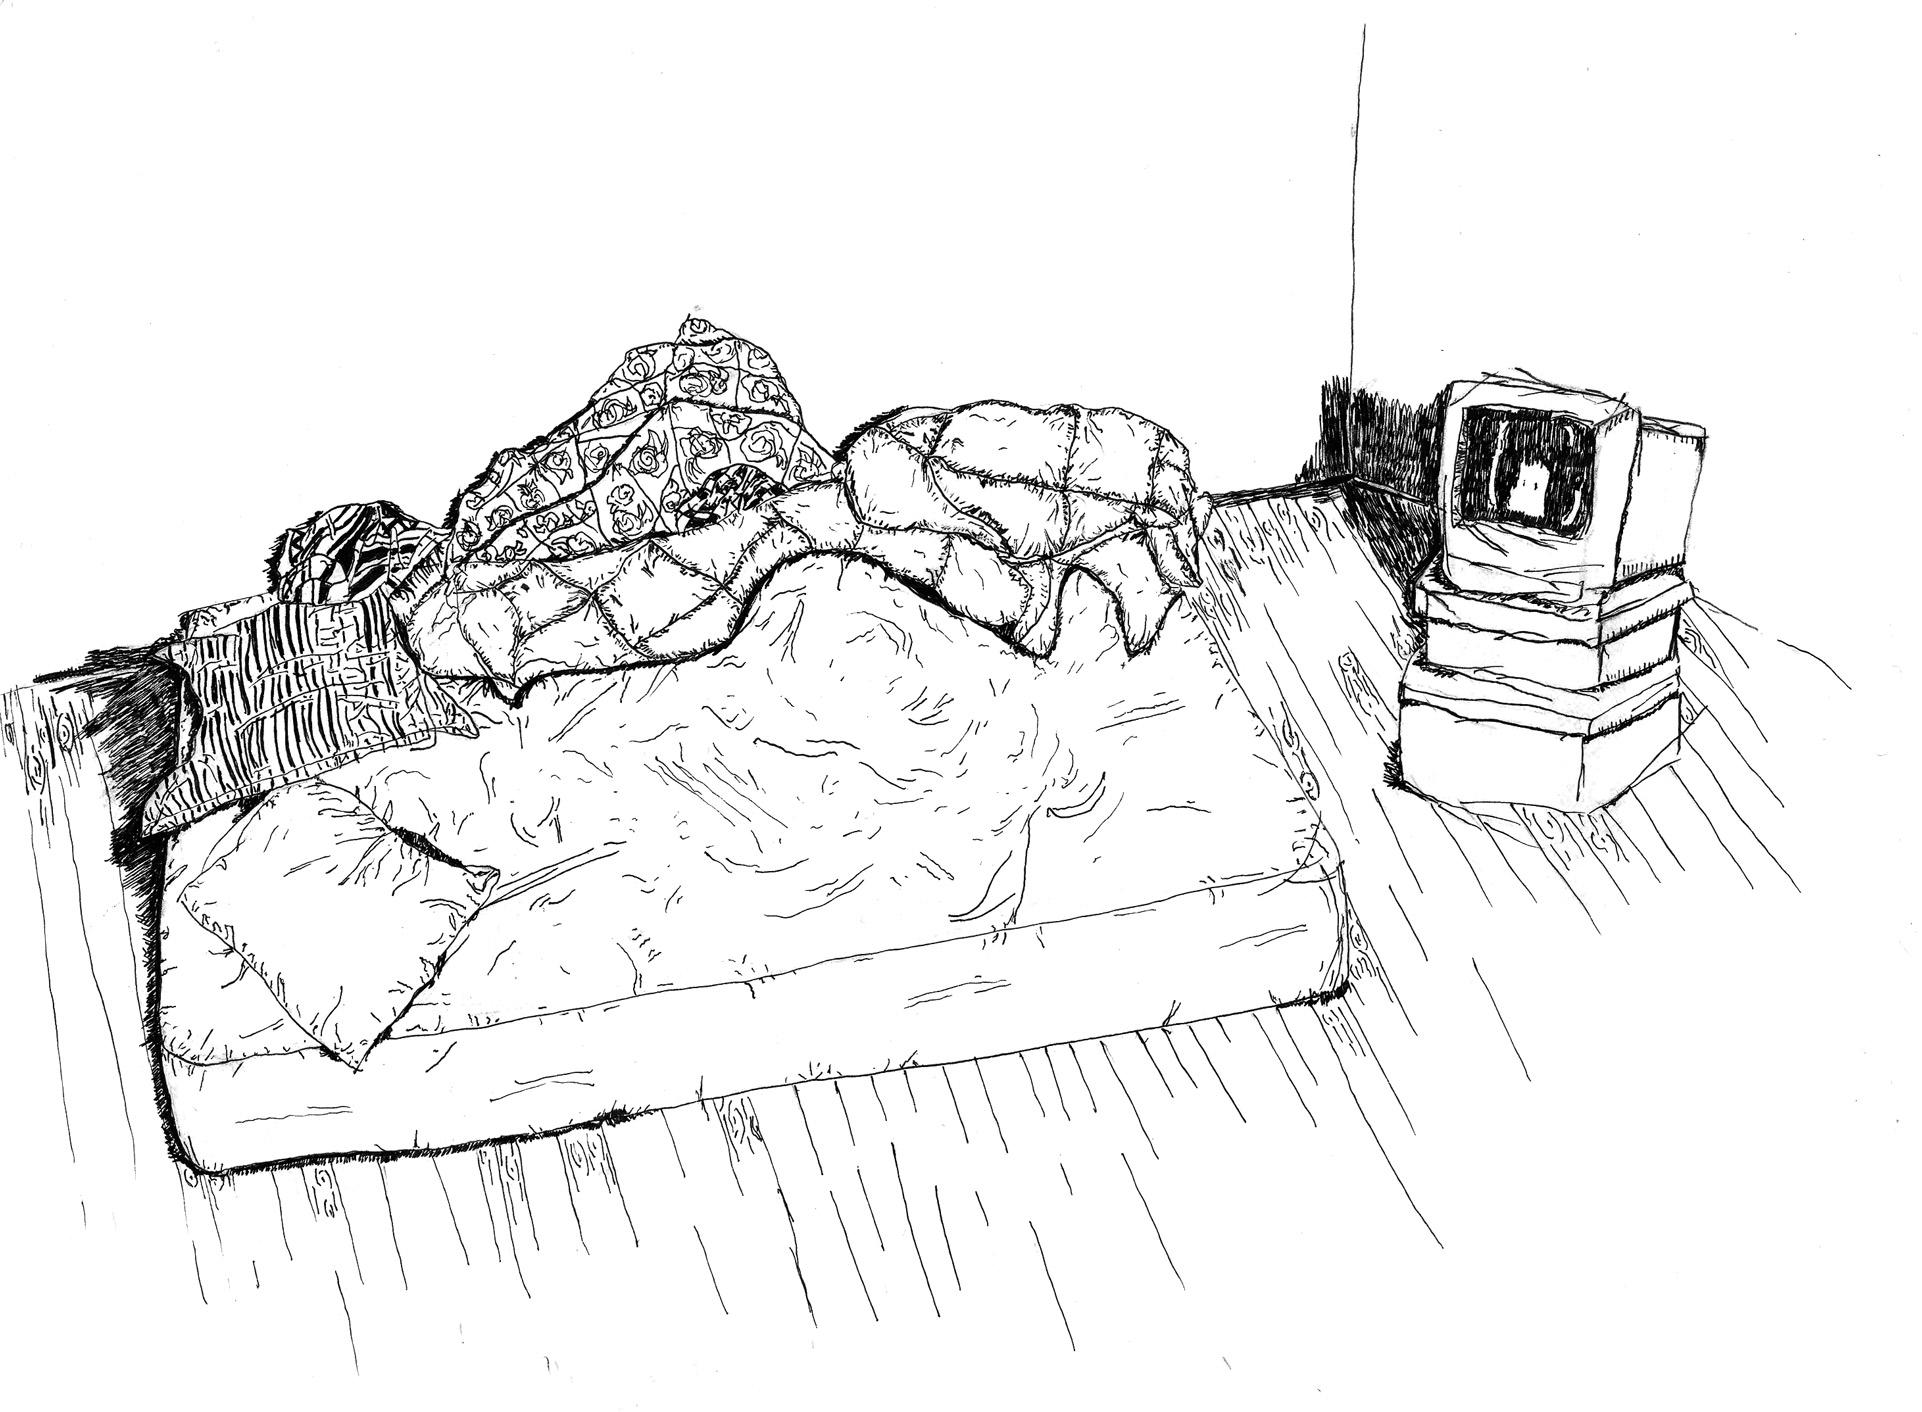 Bad Things Happen To Good People (Rape Bed)